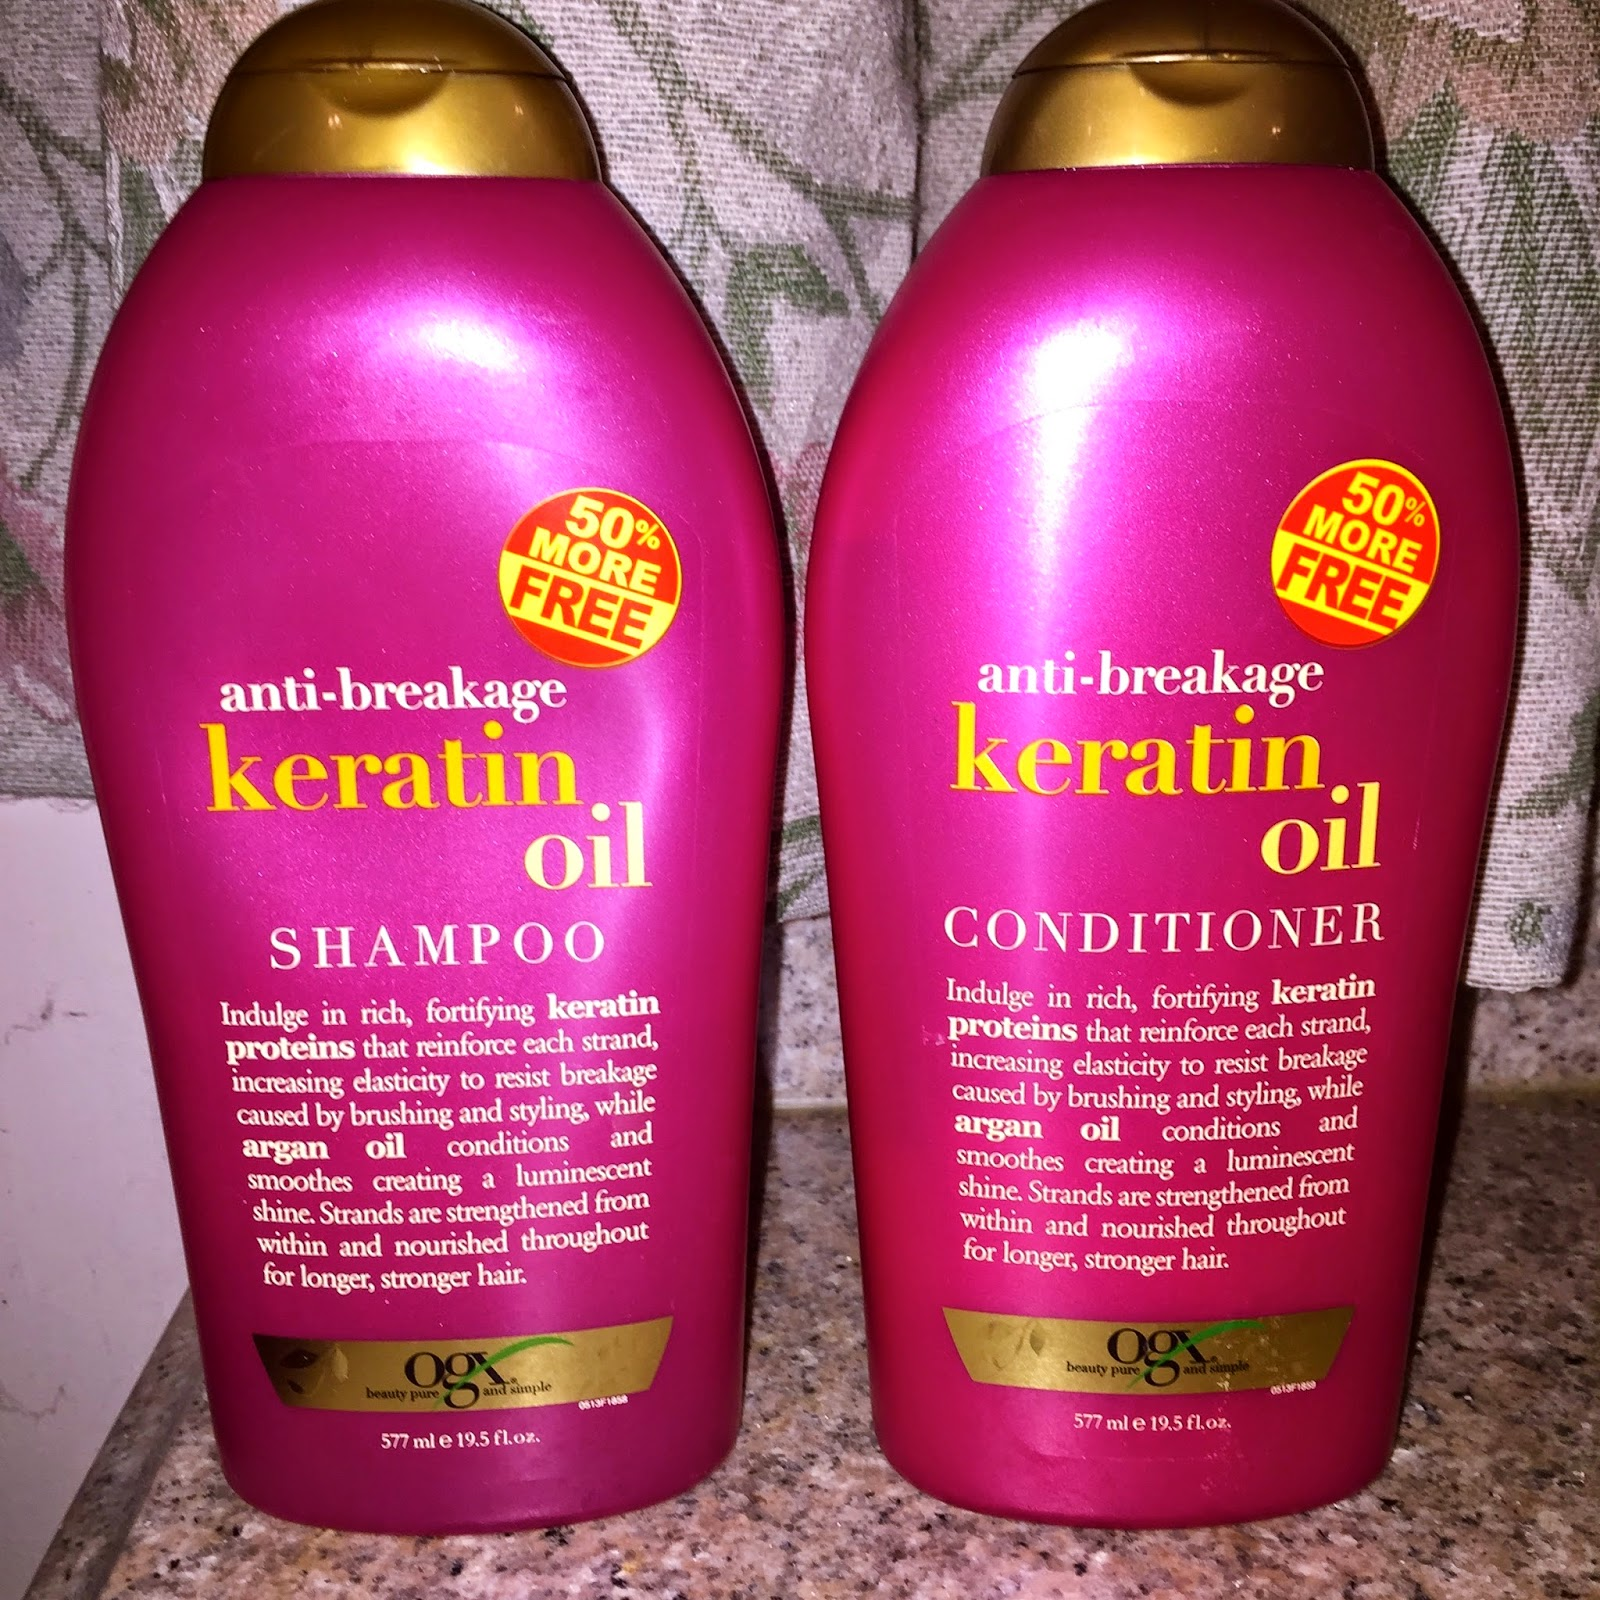 Organix keratin shampoo and conditioner reviews